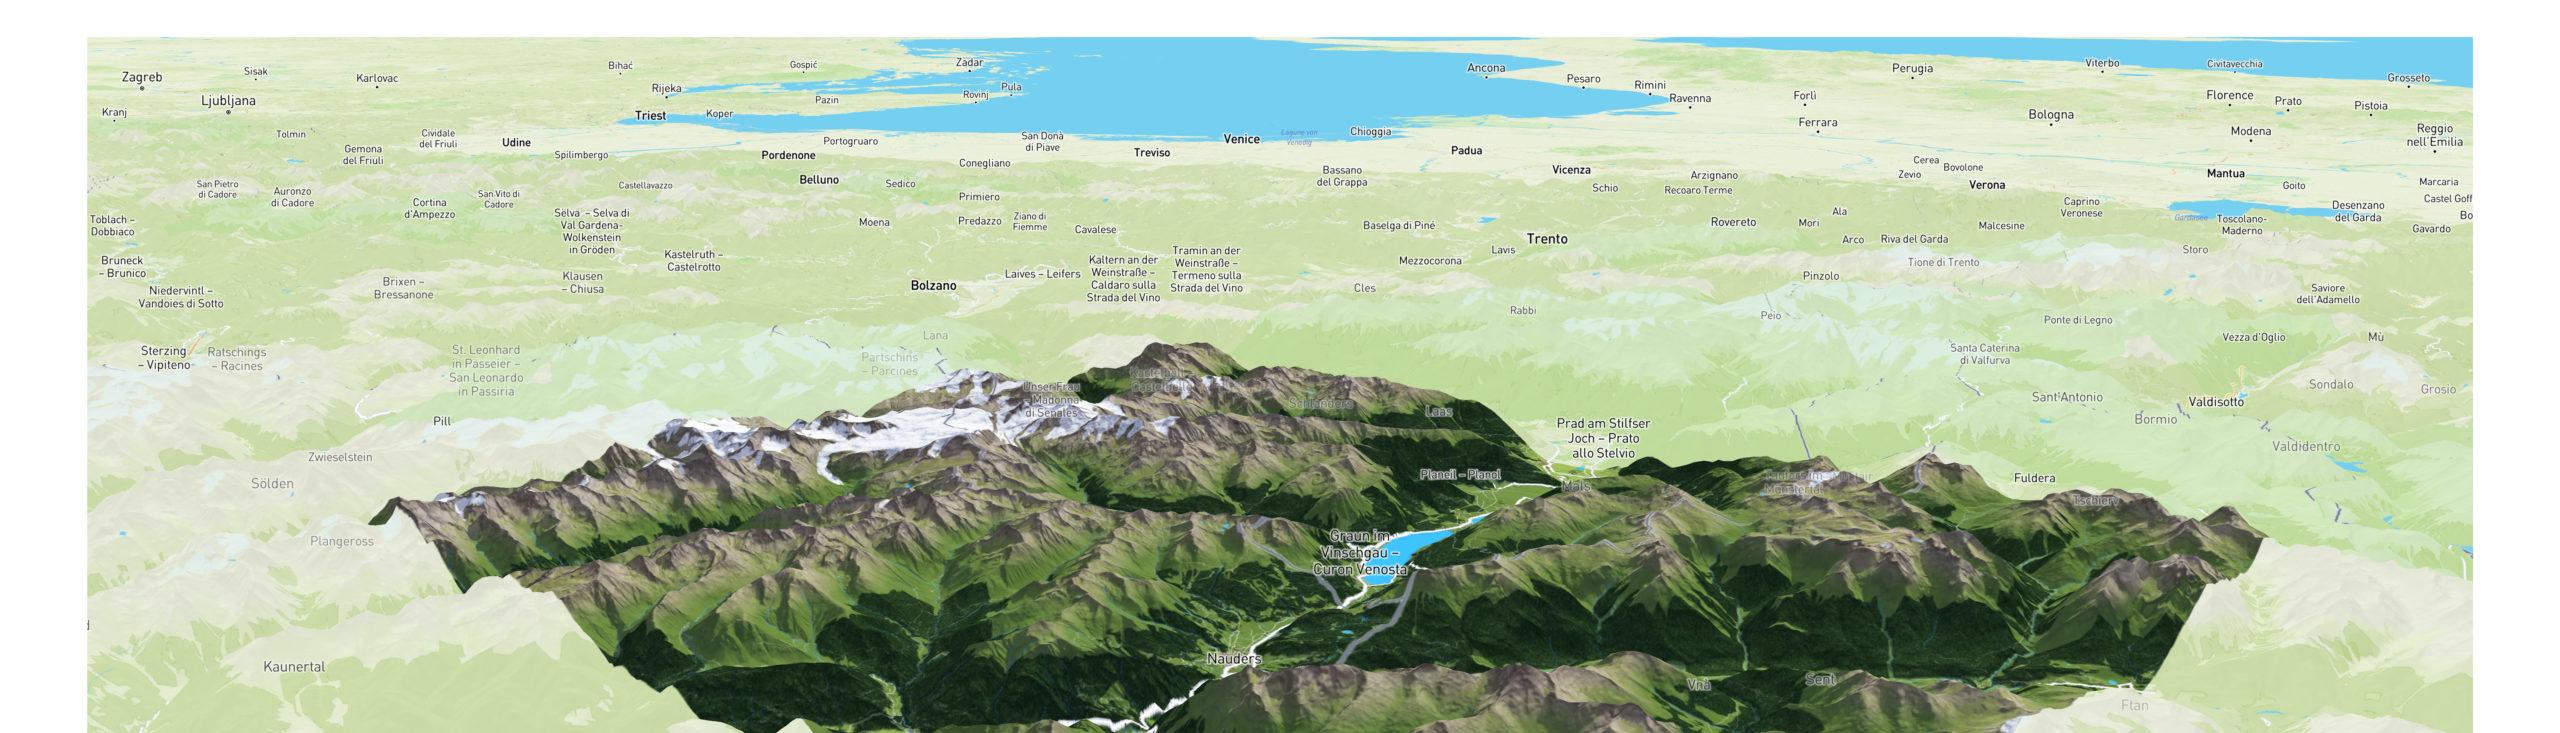 3D Panoramakarte Web - Ferienregion Reschenpass Sommer-Webkarte